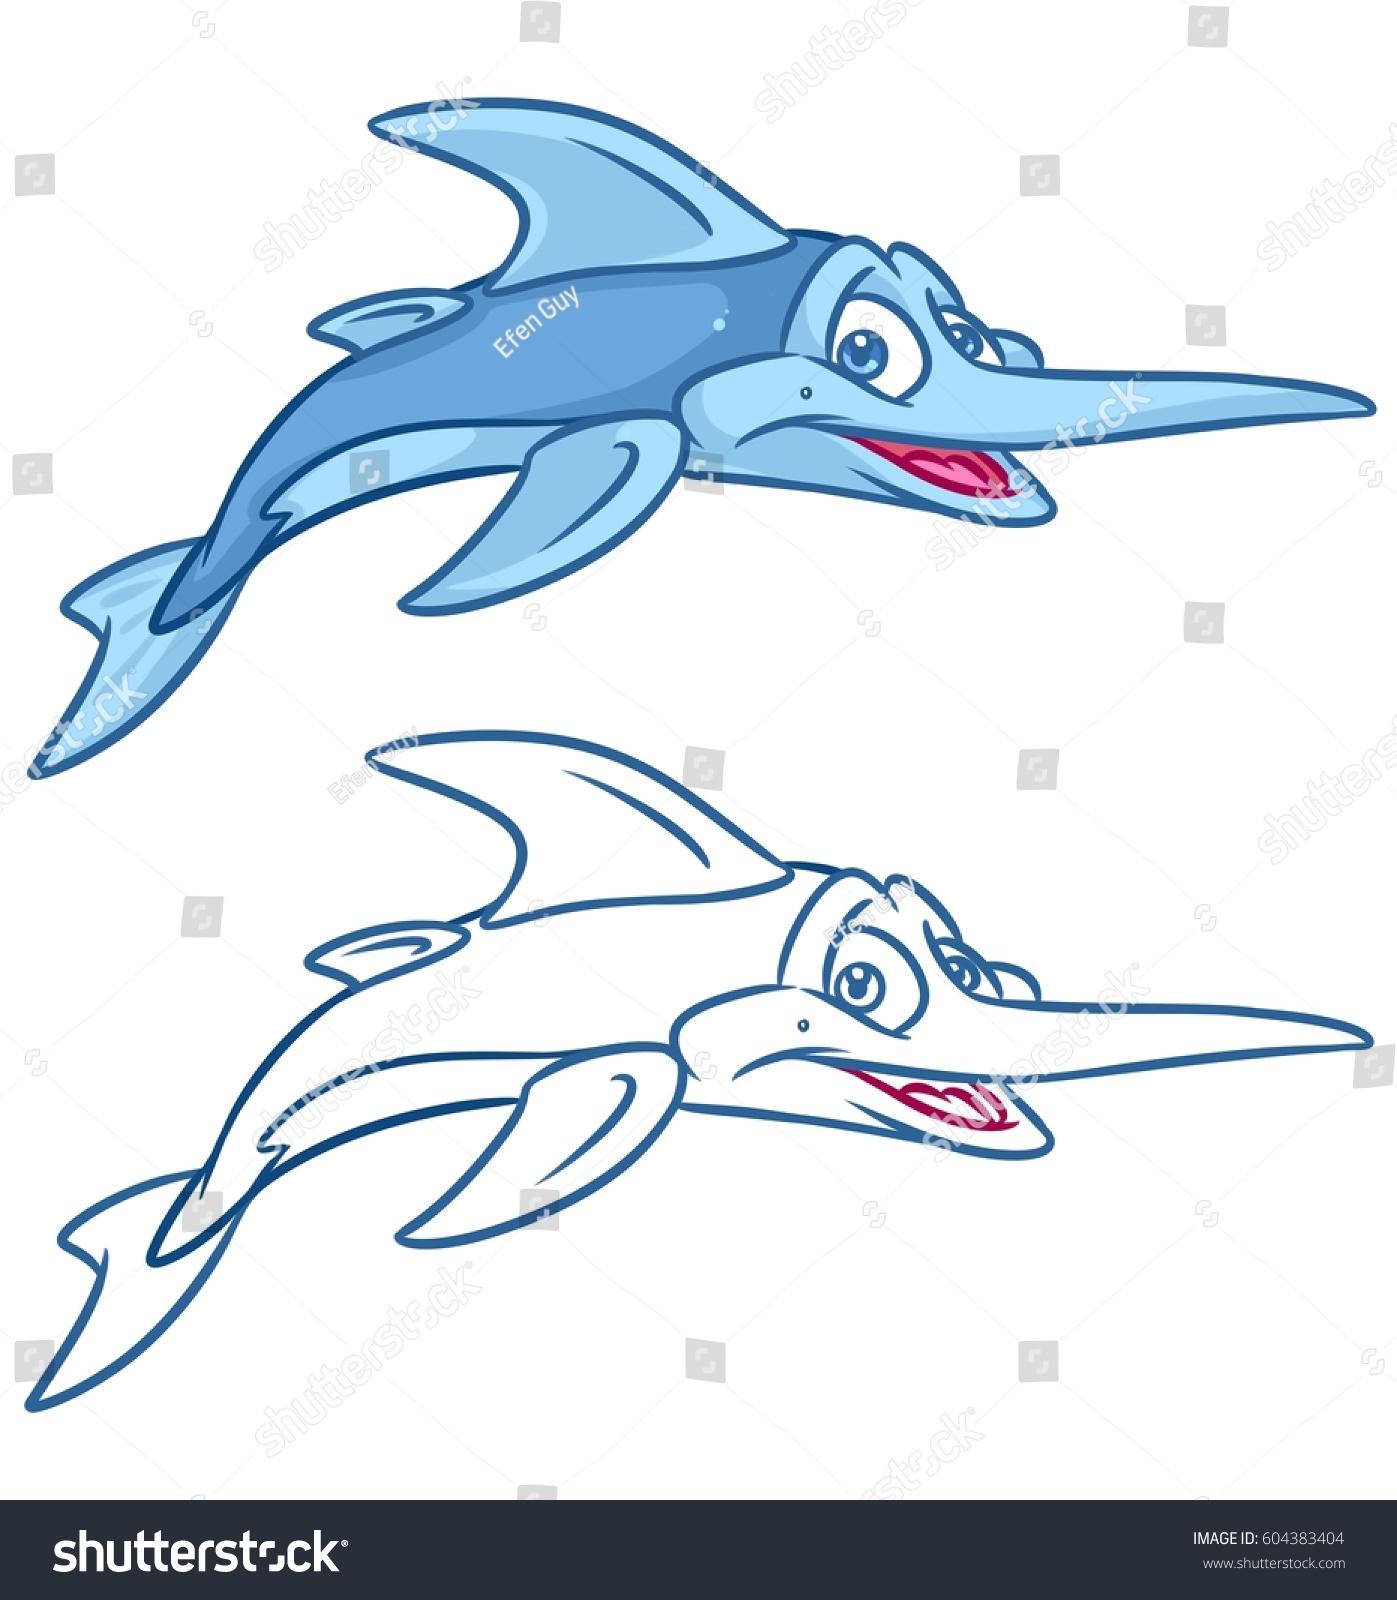 Fish Swordfish Cartoon Illustrations Isolated Image Stock ...